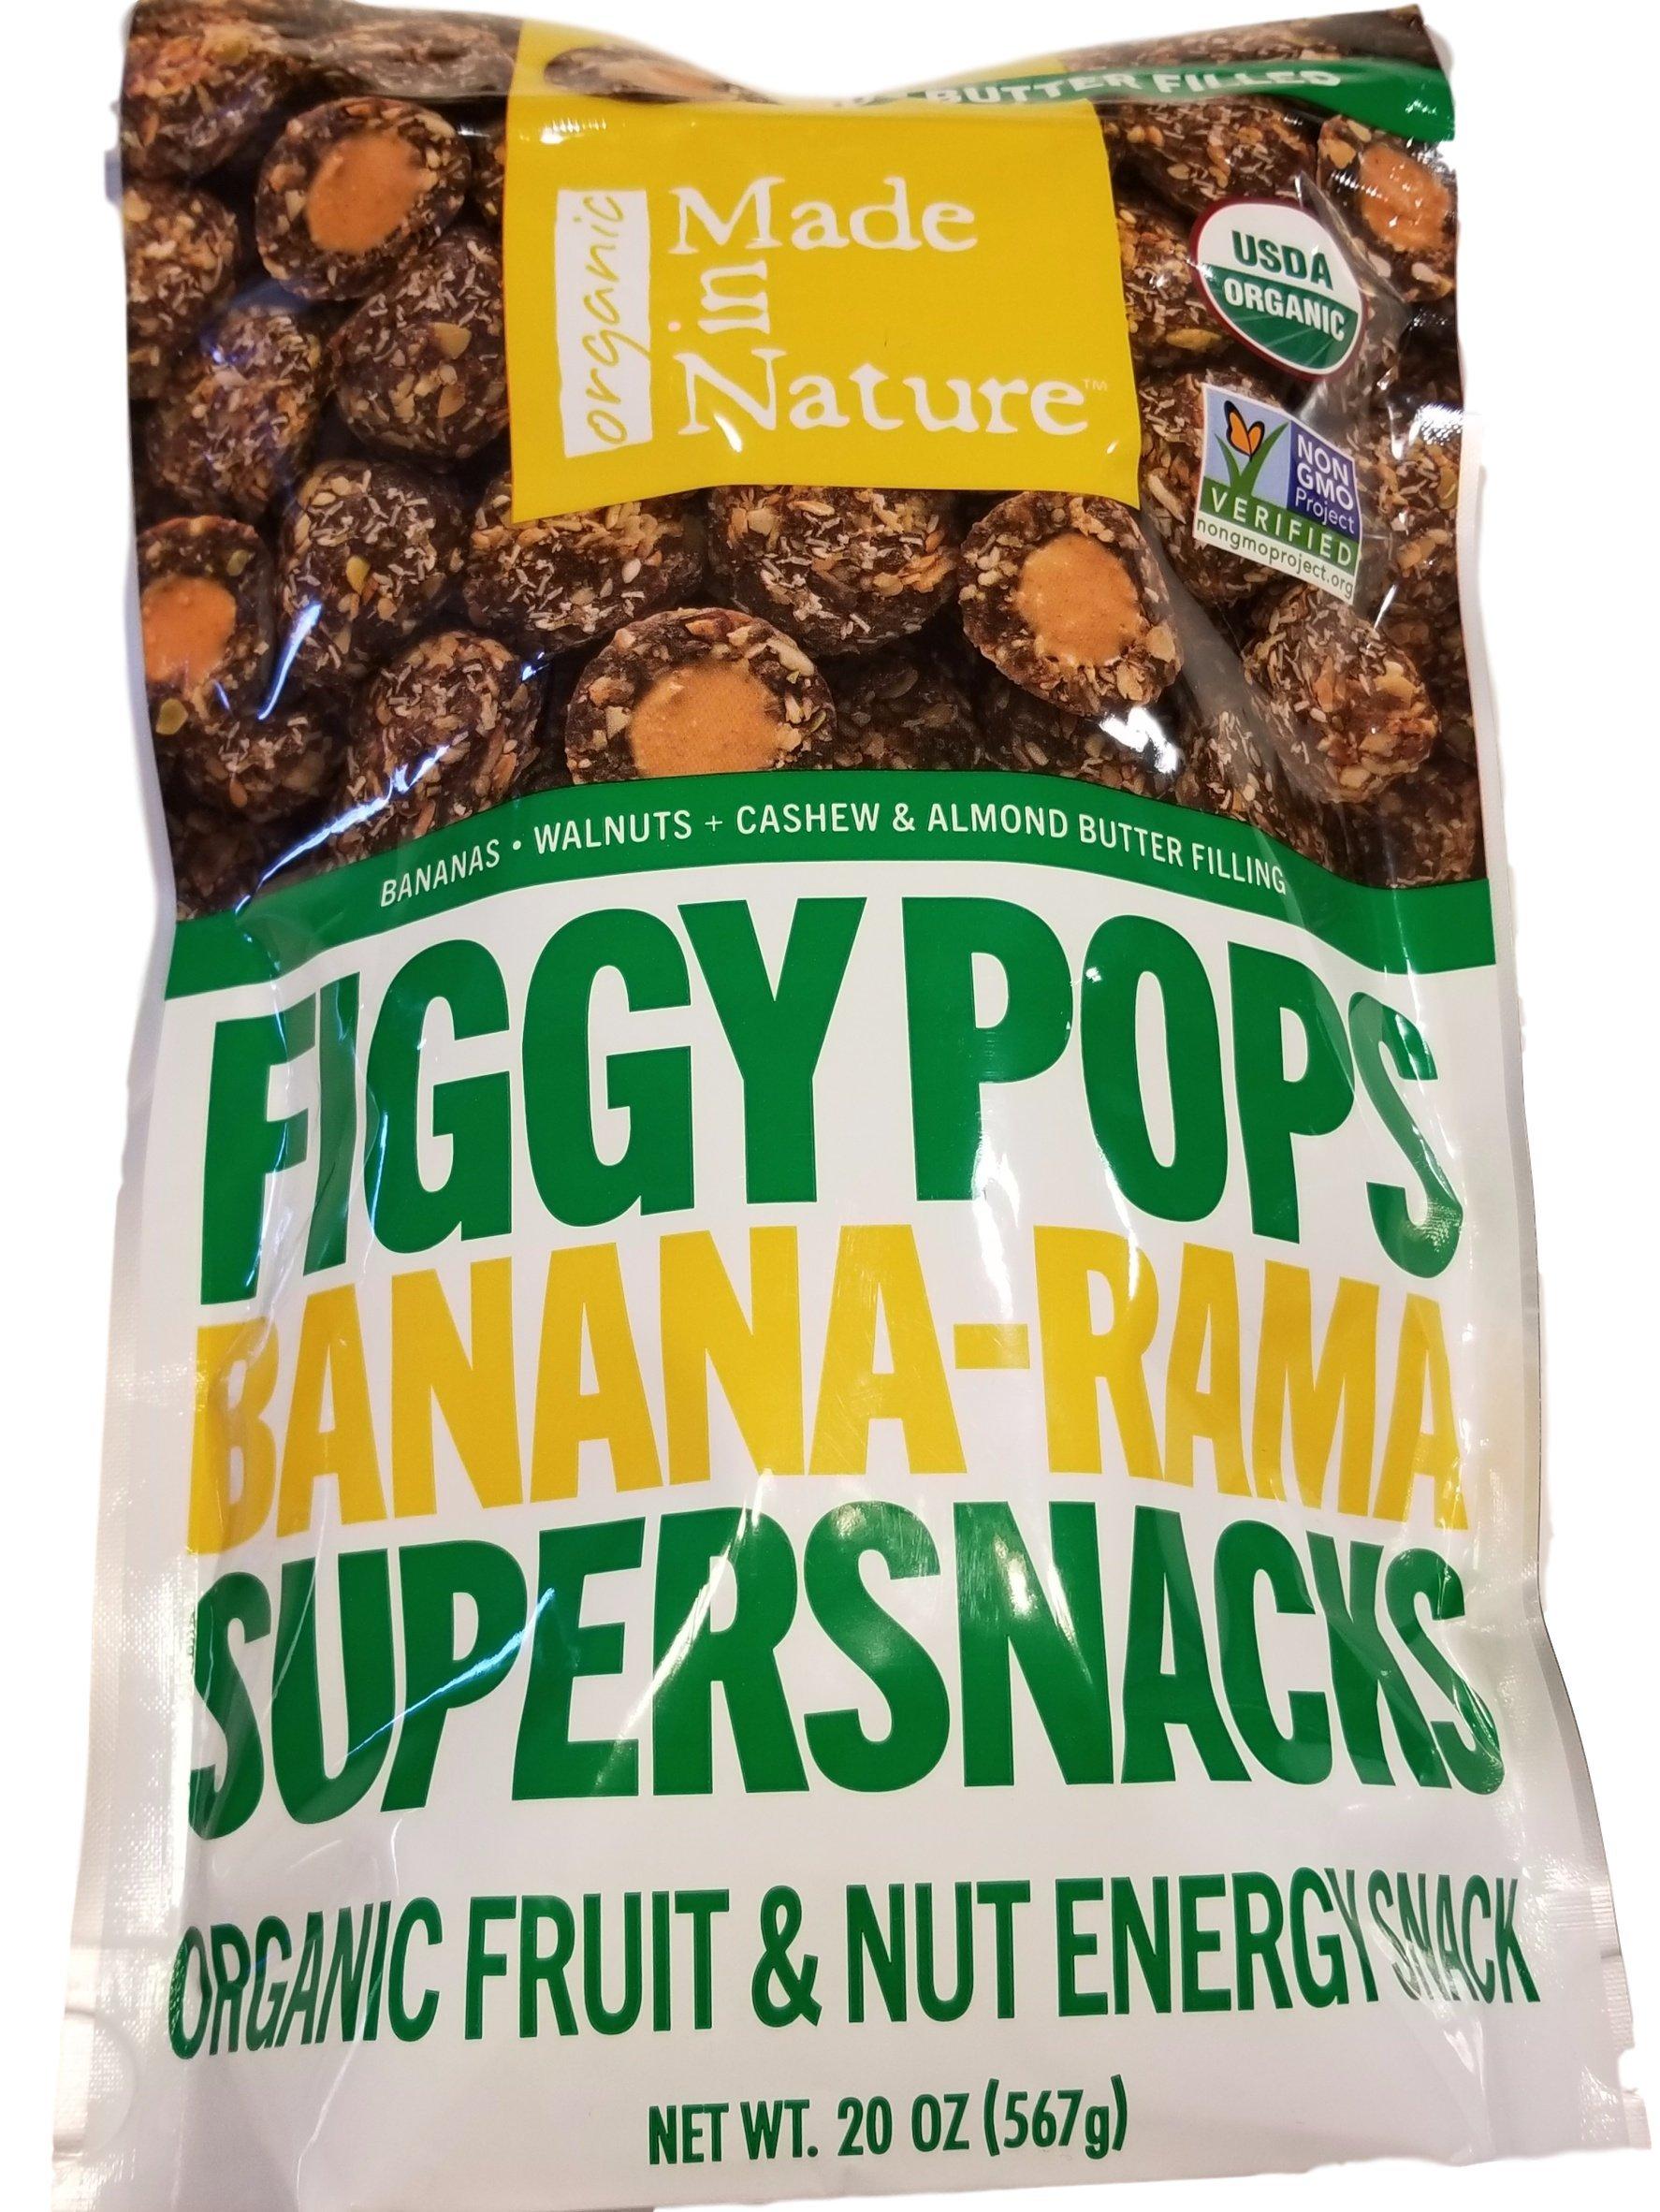 Figgy Pops Banana-Rama Super SNacks- Organic Fruit & Nut Energy Snack